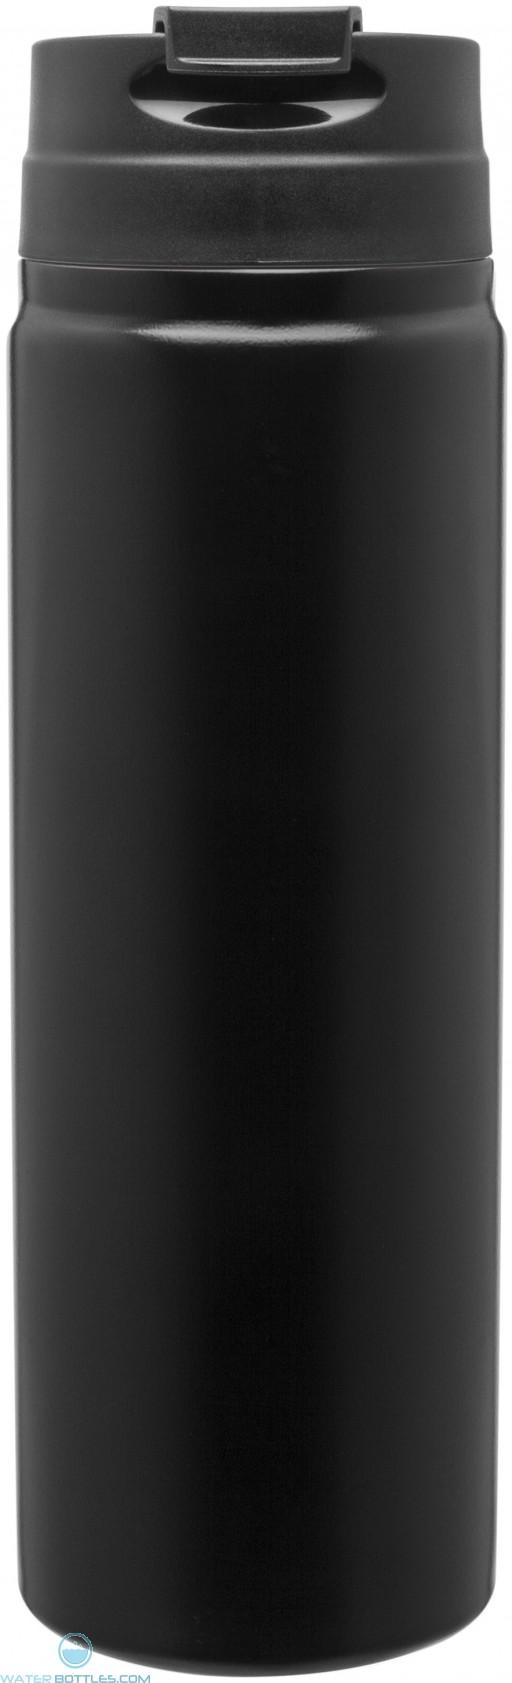 H2Go Nexus Thermal Tumblers 20 oz-Matte Black